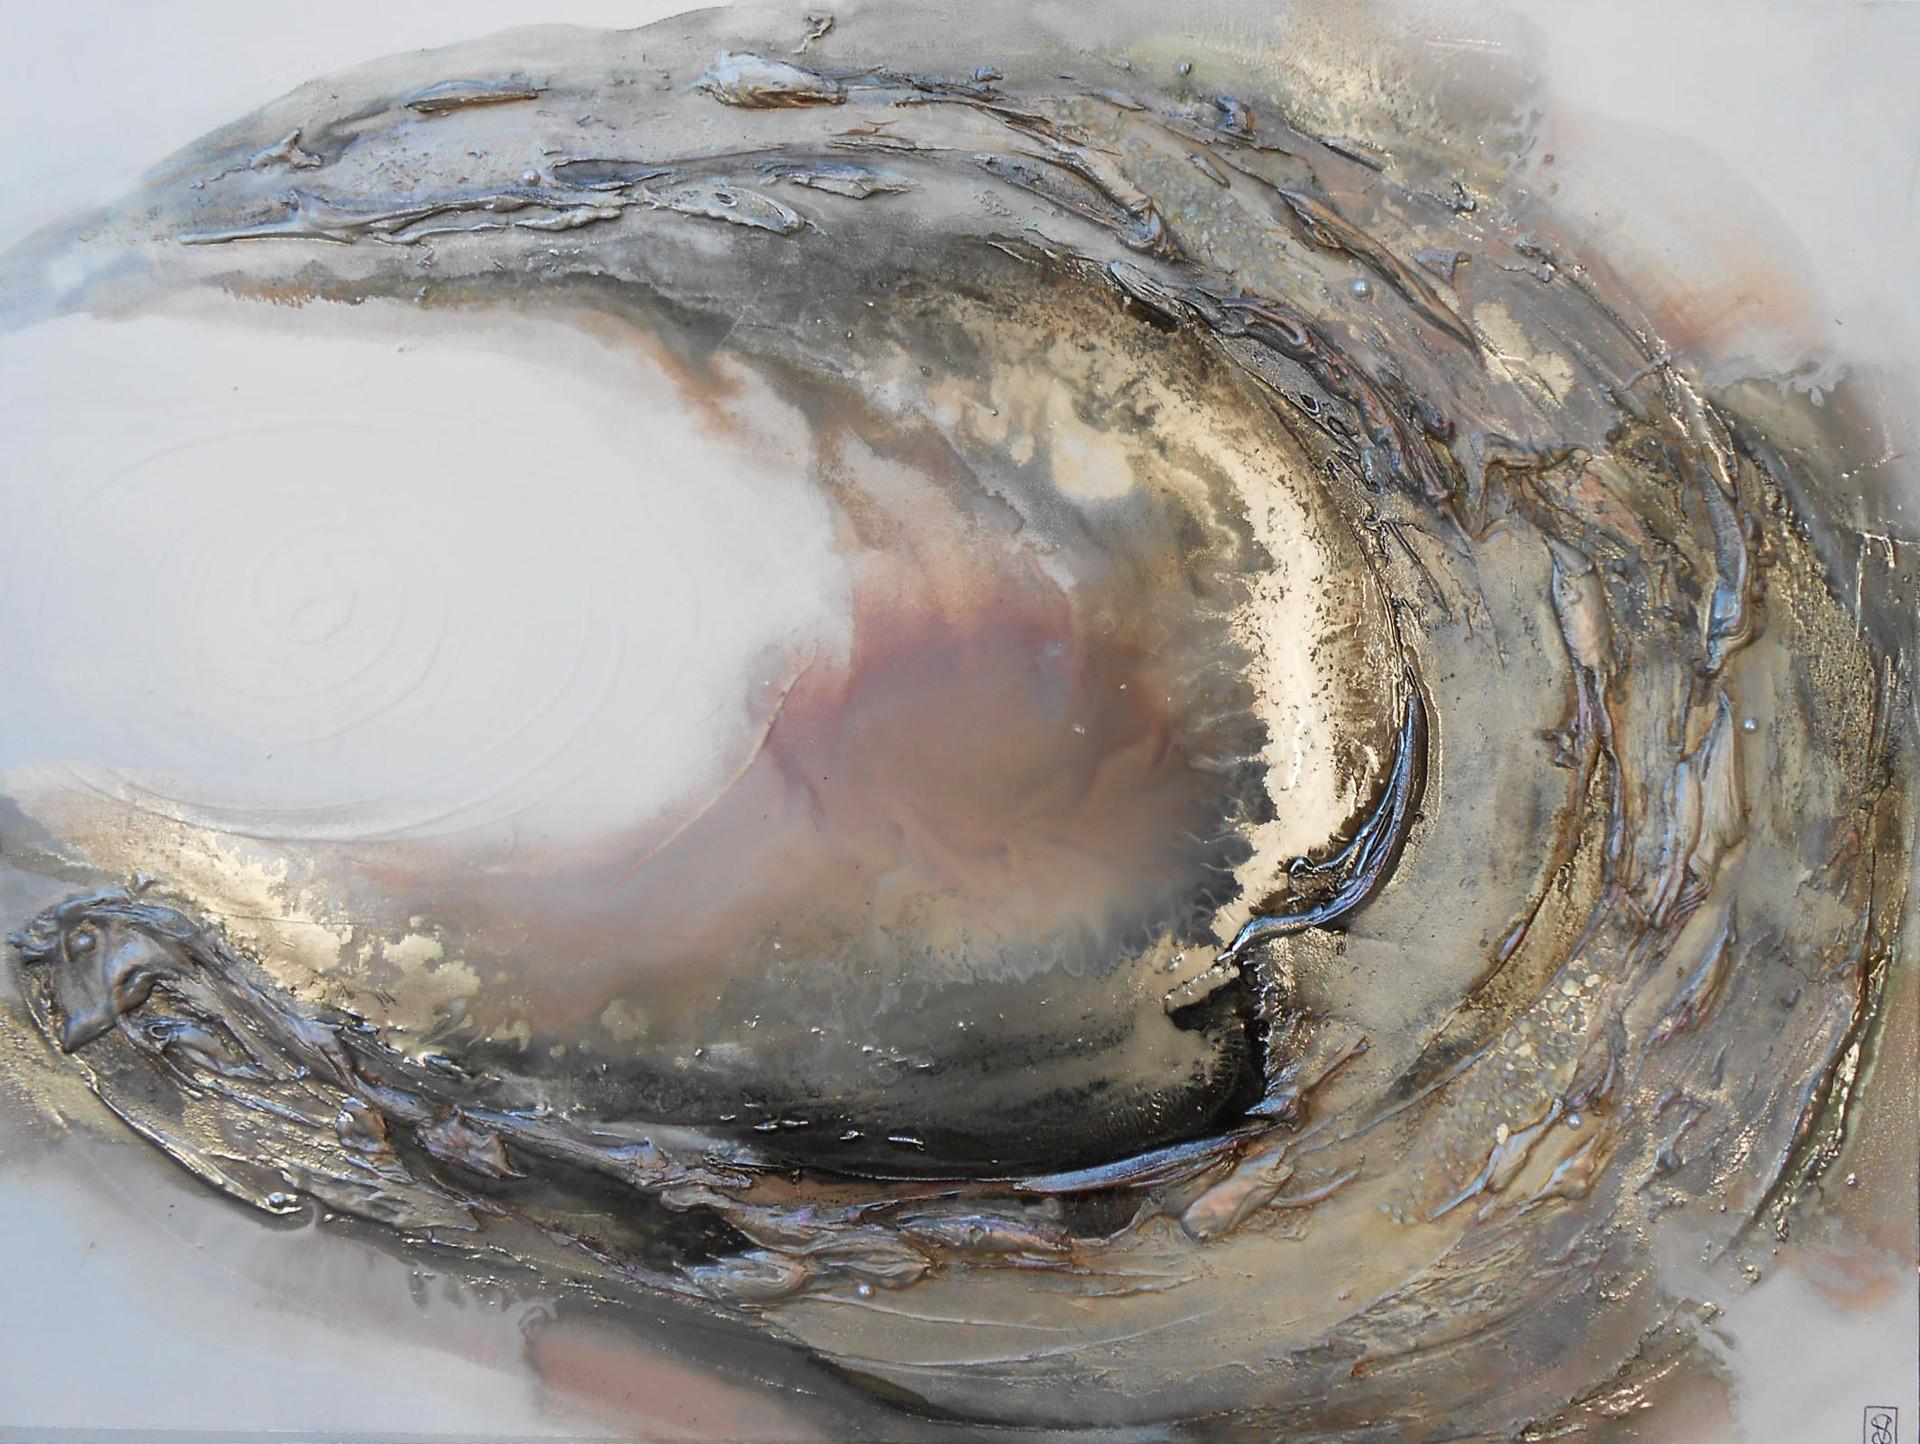 mink oyster